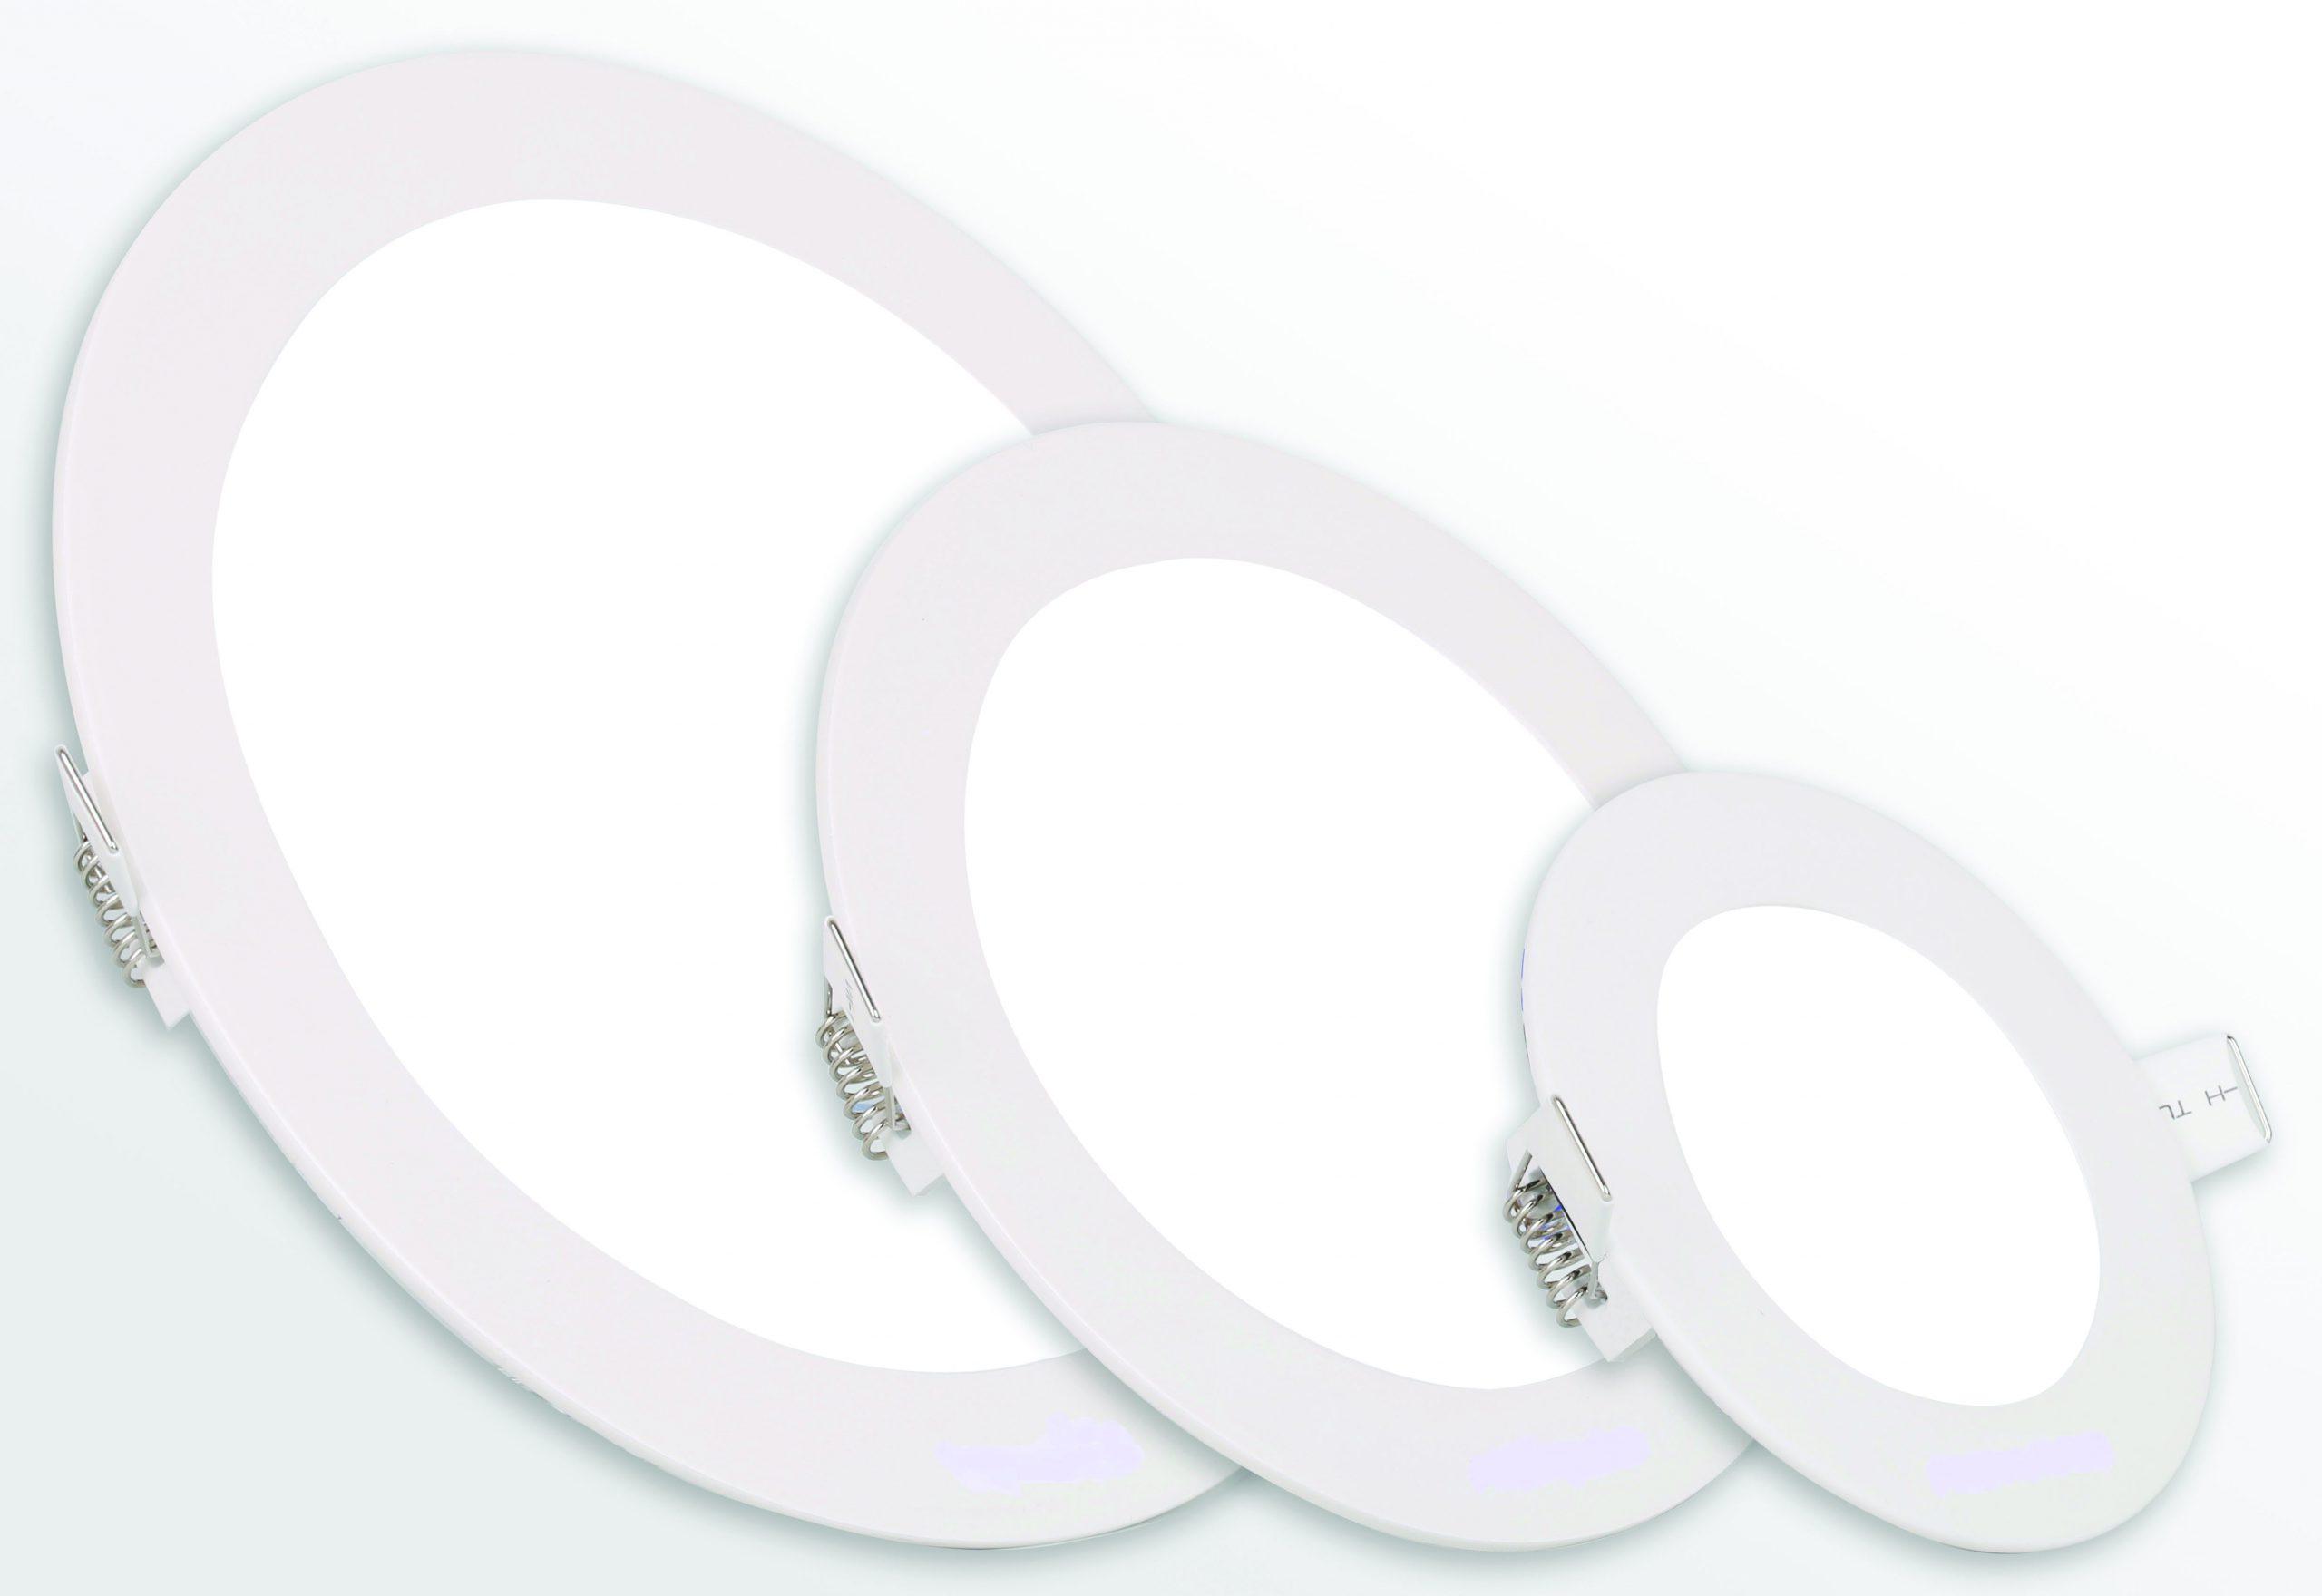 Einbau LED-Panel Slimbau, runde Ausführung